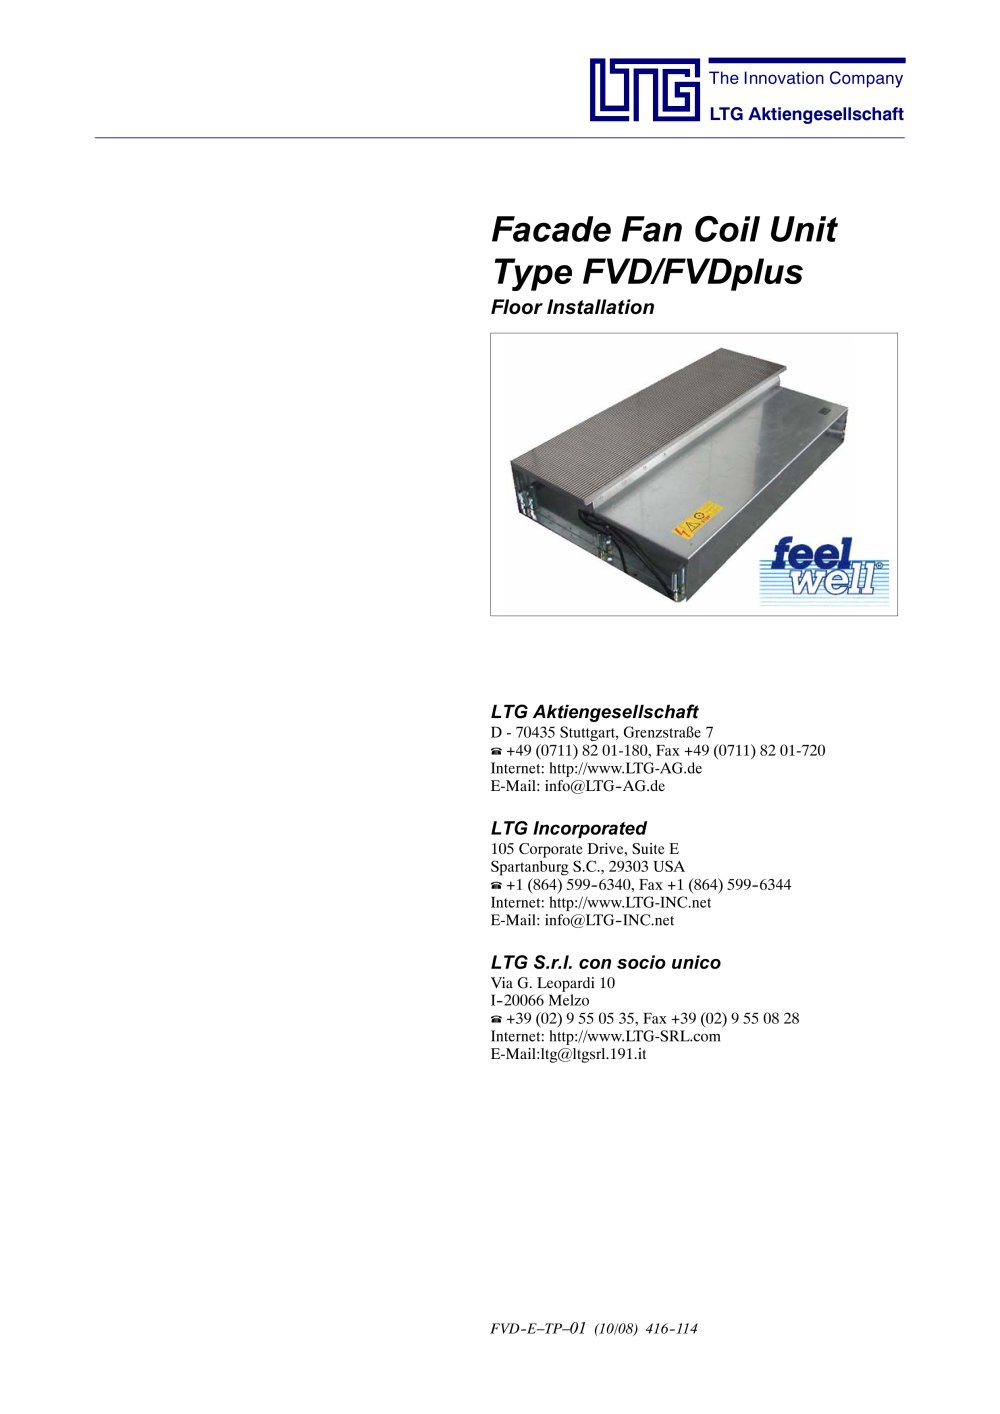 facade fancoil unit fvd 122998_1b?resize\\\\\\\=665%2C940 broan fan control schematic wiring diagram shrutiradio Vent a Hood Wiring Diagram at gsmx.co